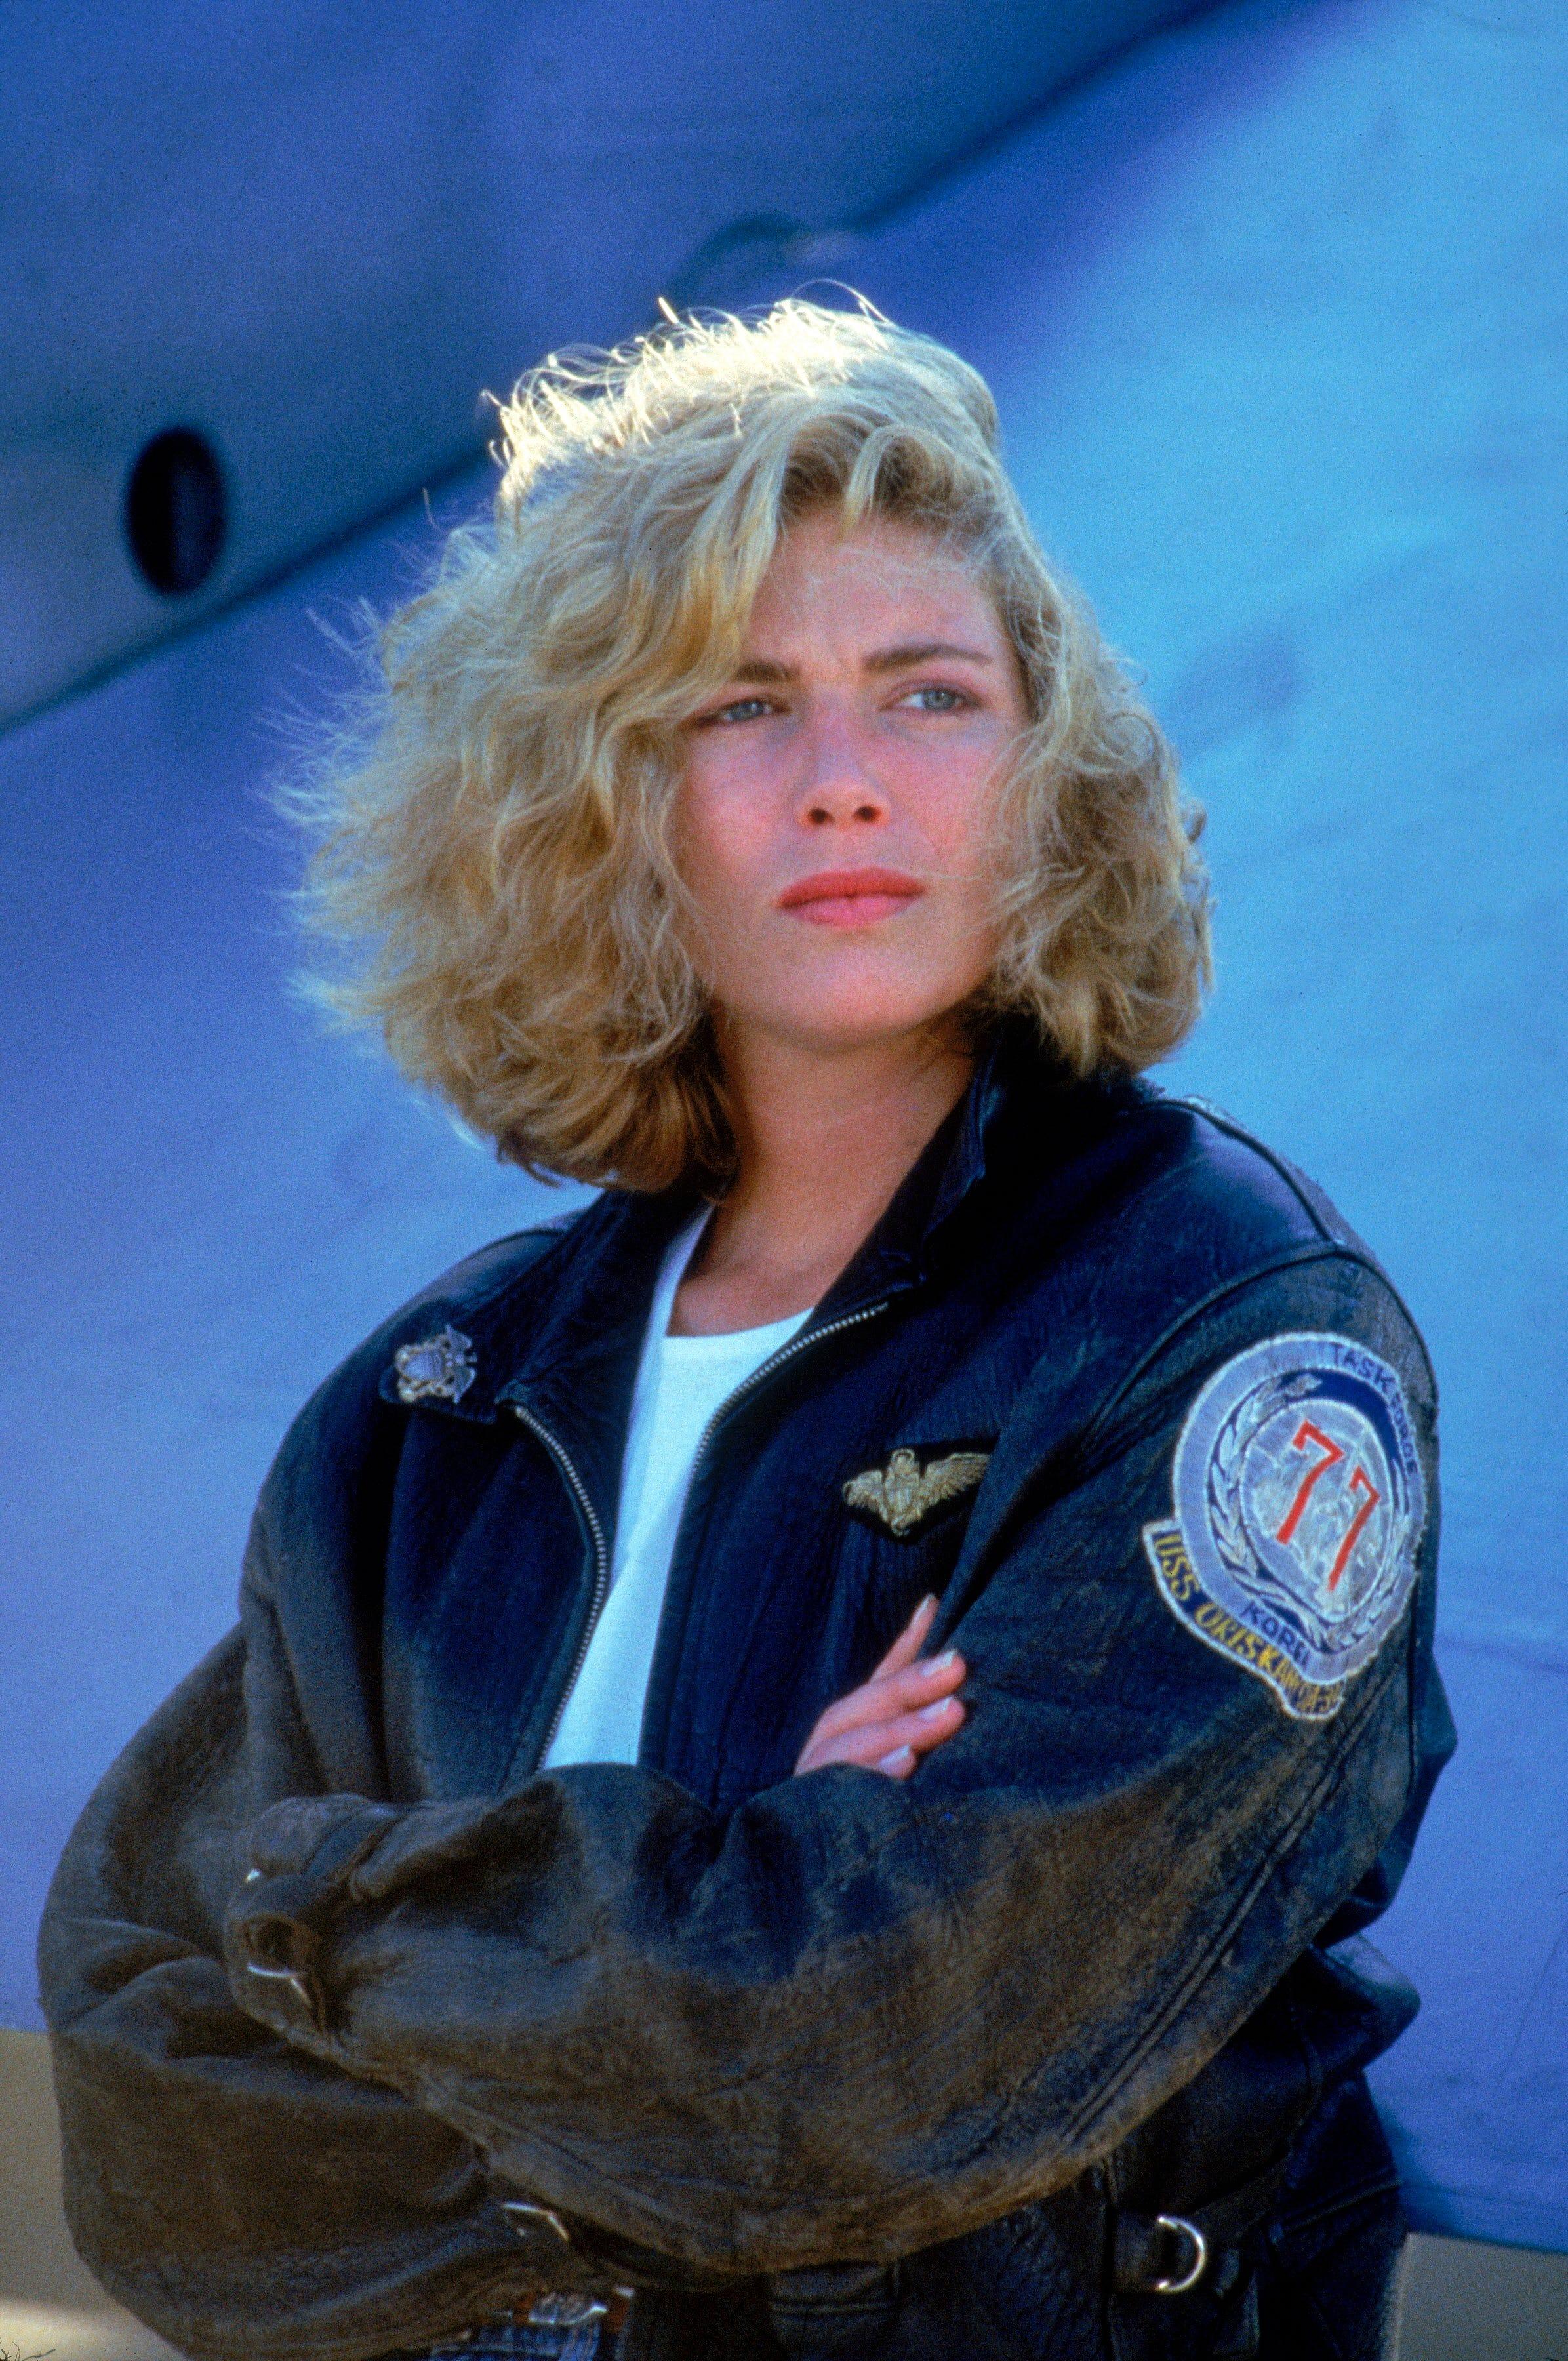 Kelly McGillis on 'Top Gun: Maverick' snub: I wasn't asked